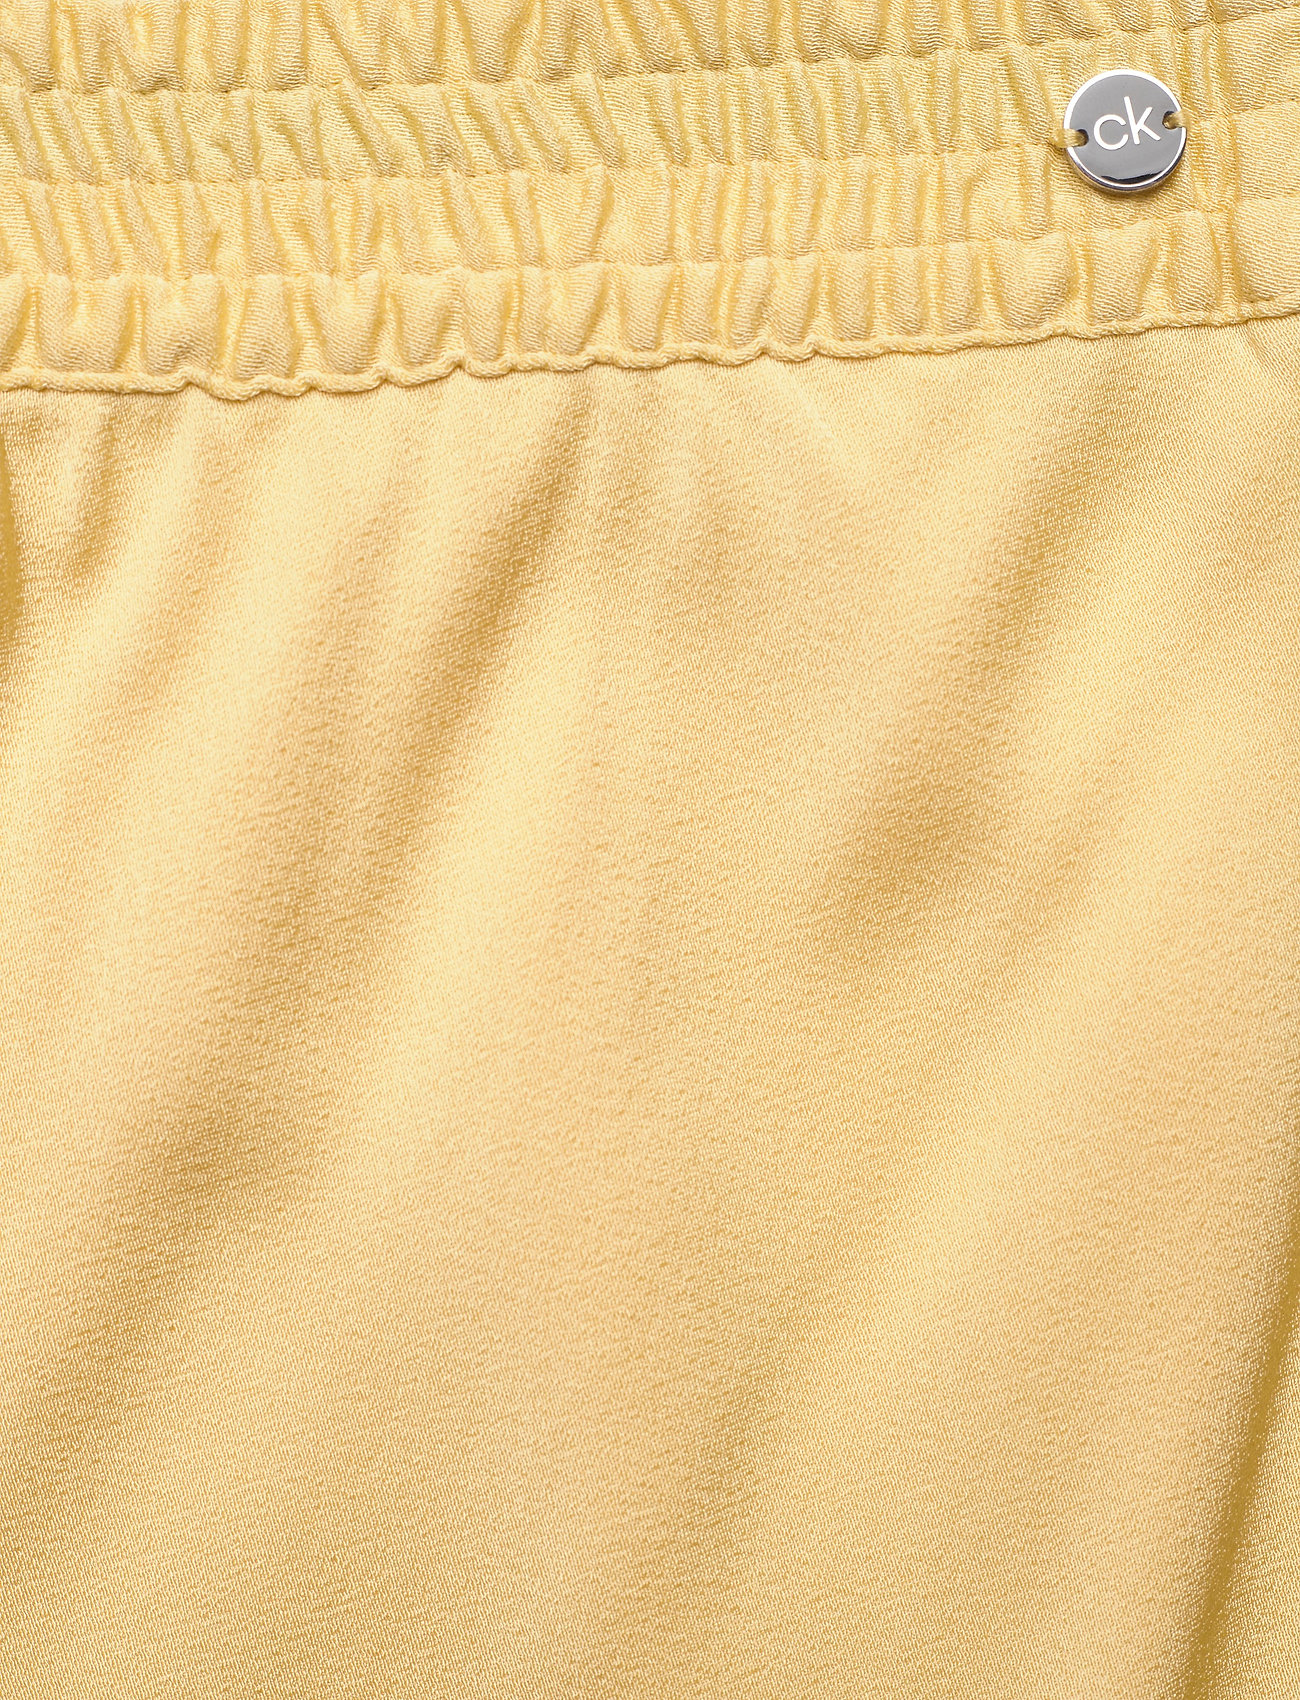 Elasticated Bias Cut Midi Skirt (Muted Yellow) (1700 kr) - Calvin Klein